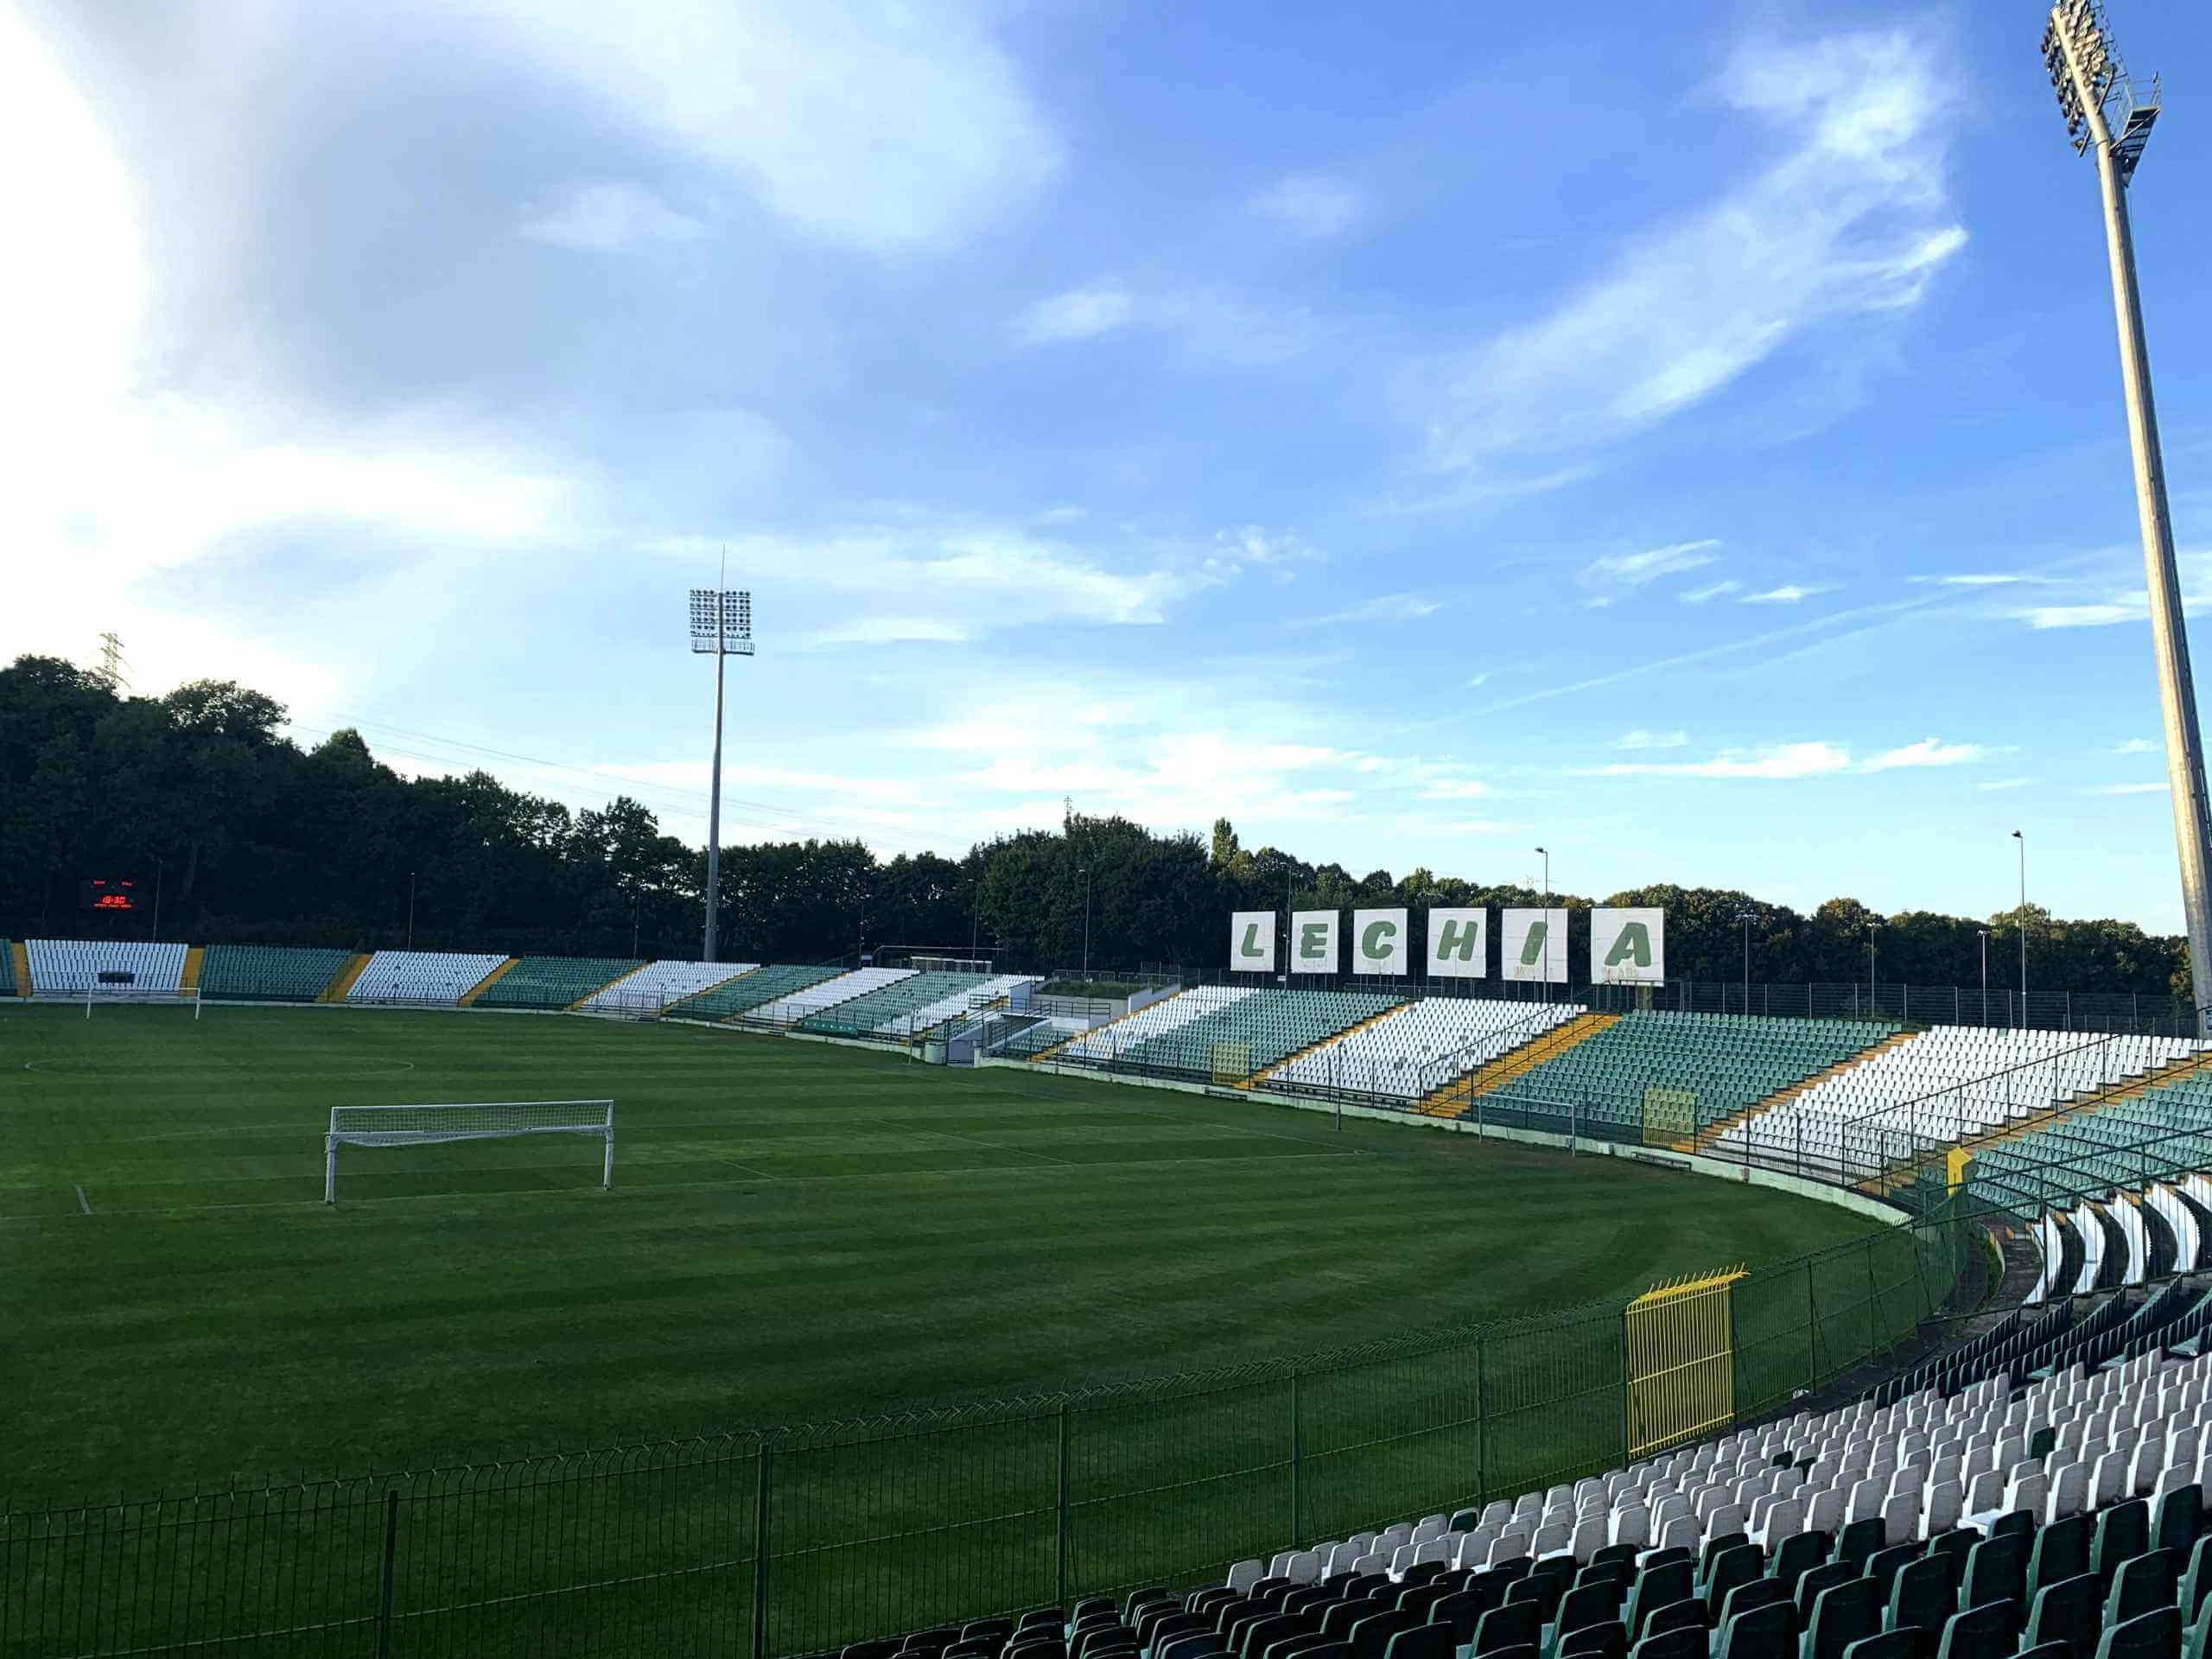 kluby piłkarskie Trójmiasto Gdańsk Lechia stadion Skarby Miasta reportaże